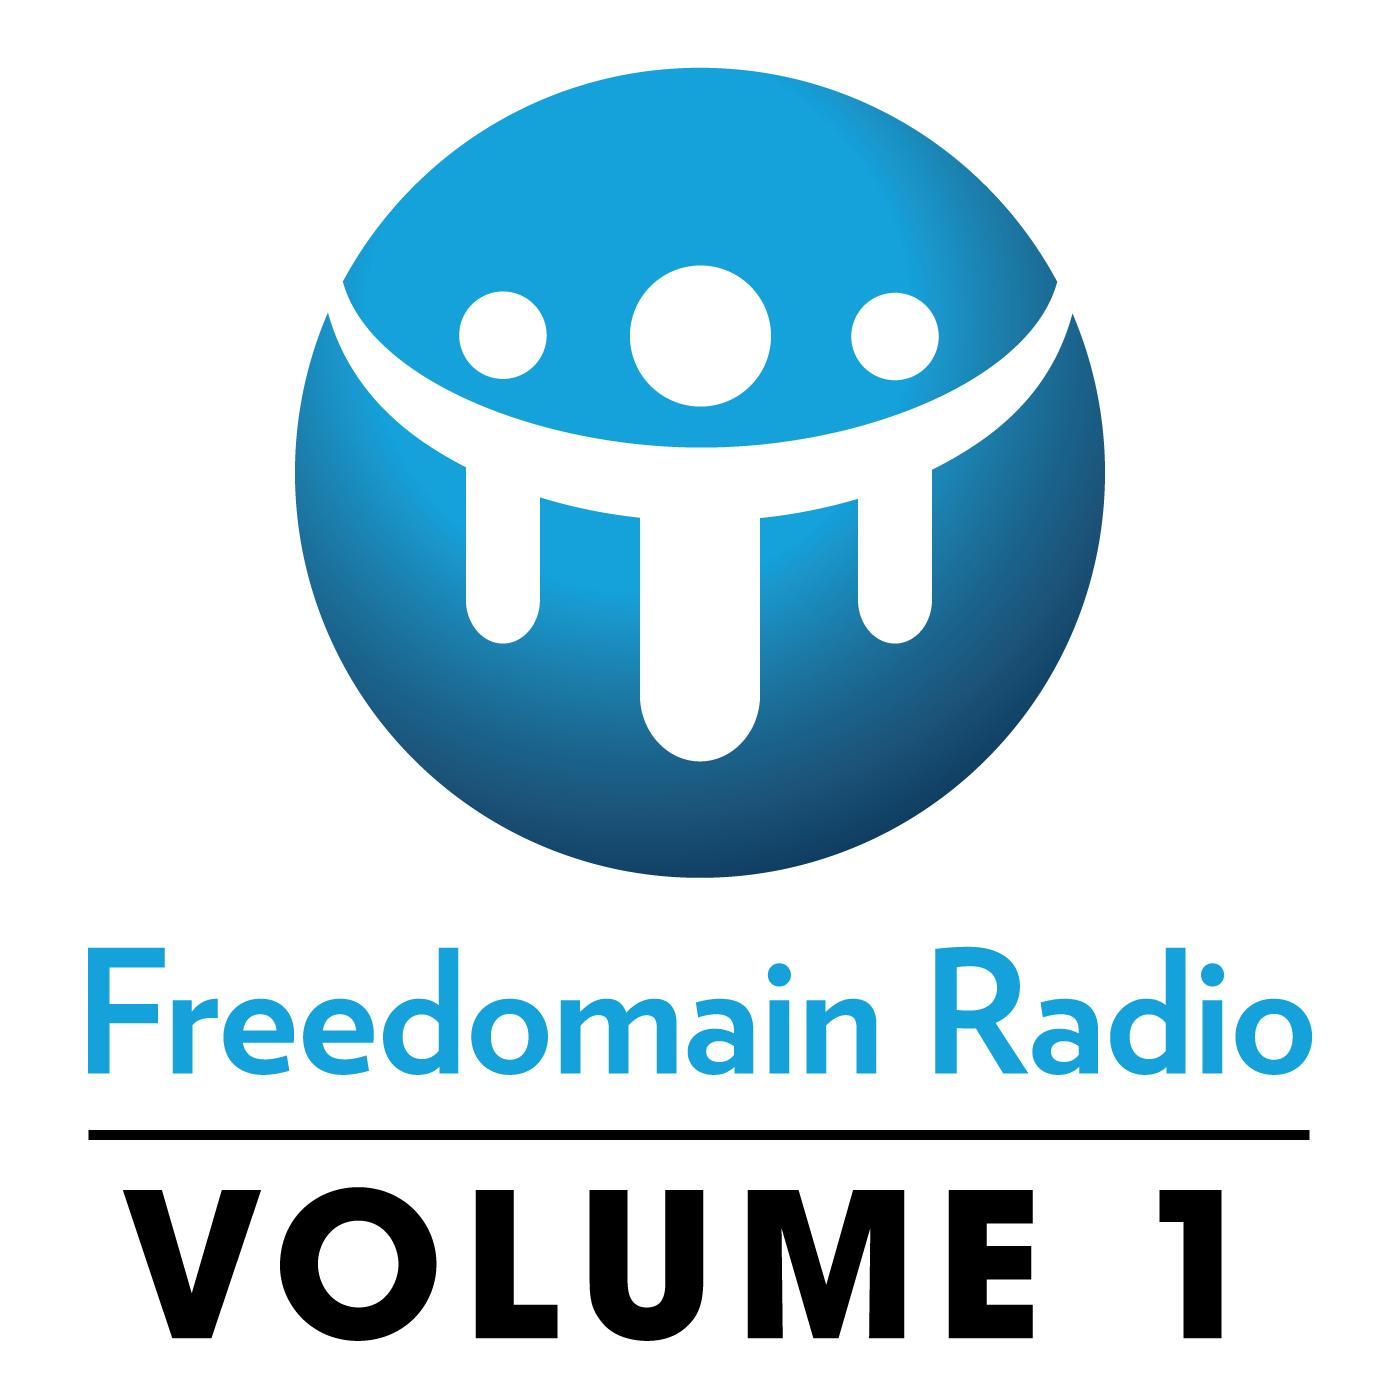 Freedomain Radio! Volume 1: Introduction - 271